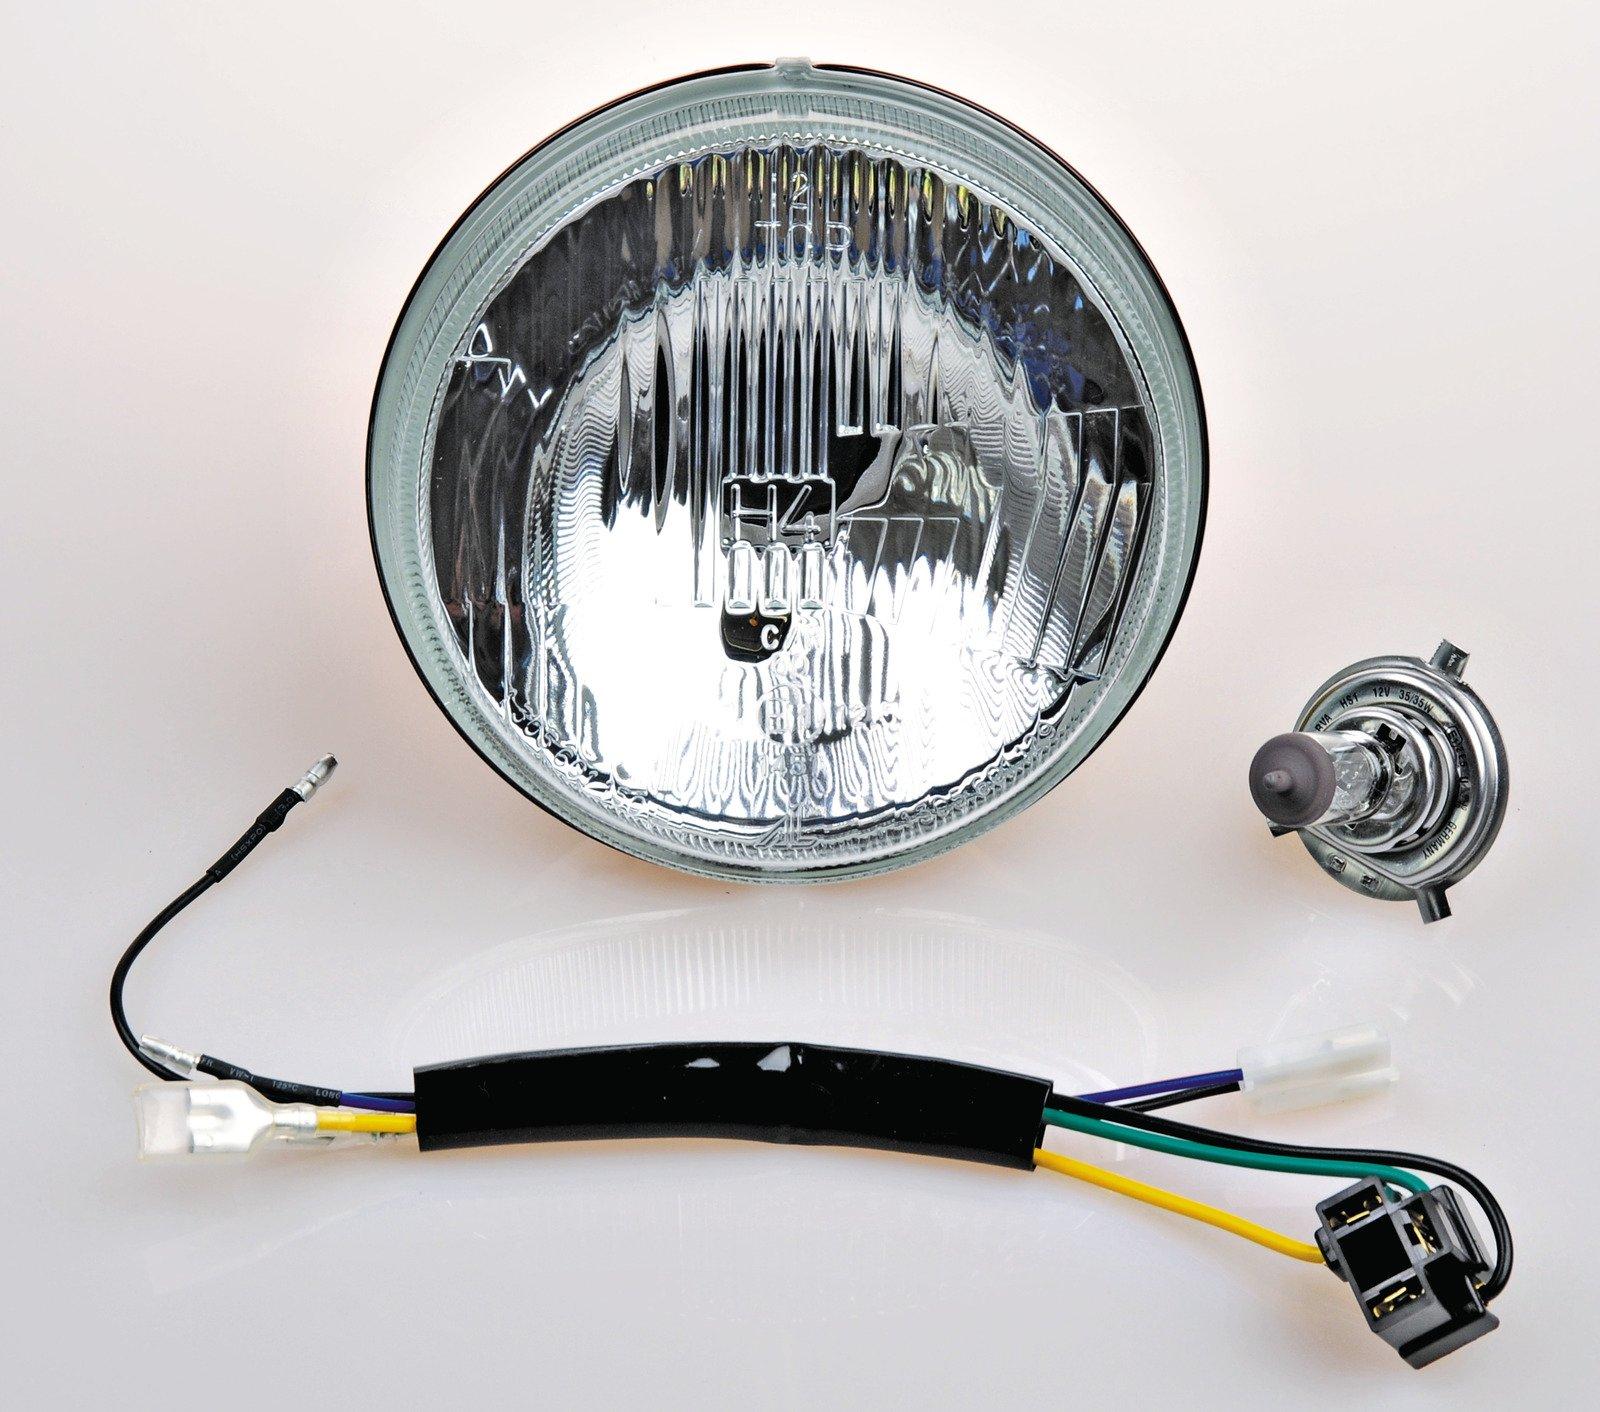 Headlights Supplies Yamaha 250 Enduro Wiring Harness Xt250 1976 1985 Xt500 6 Volt H4 Headlight Conversion Kit 10 013